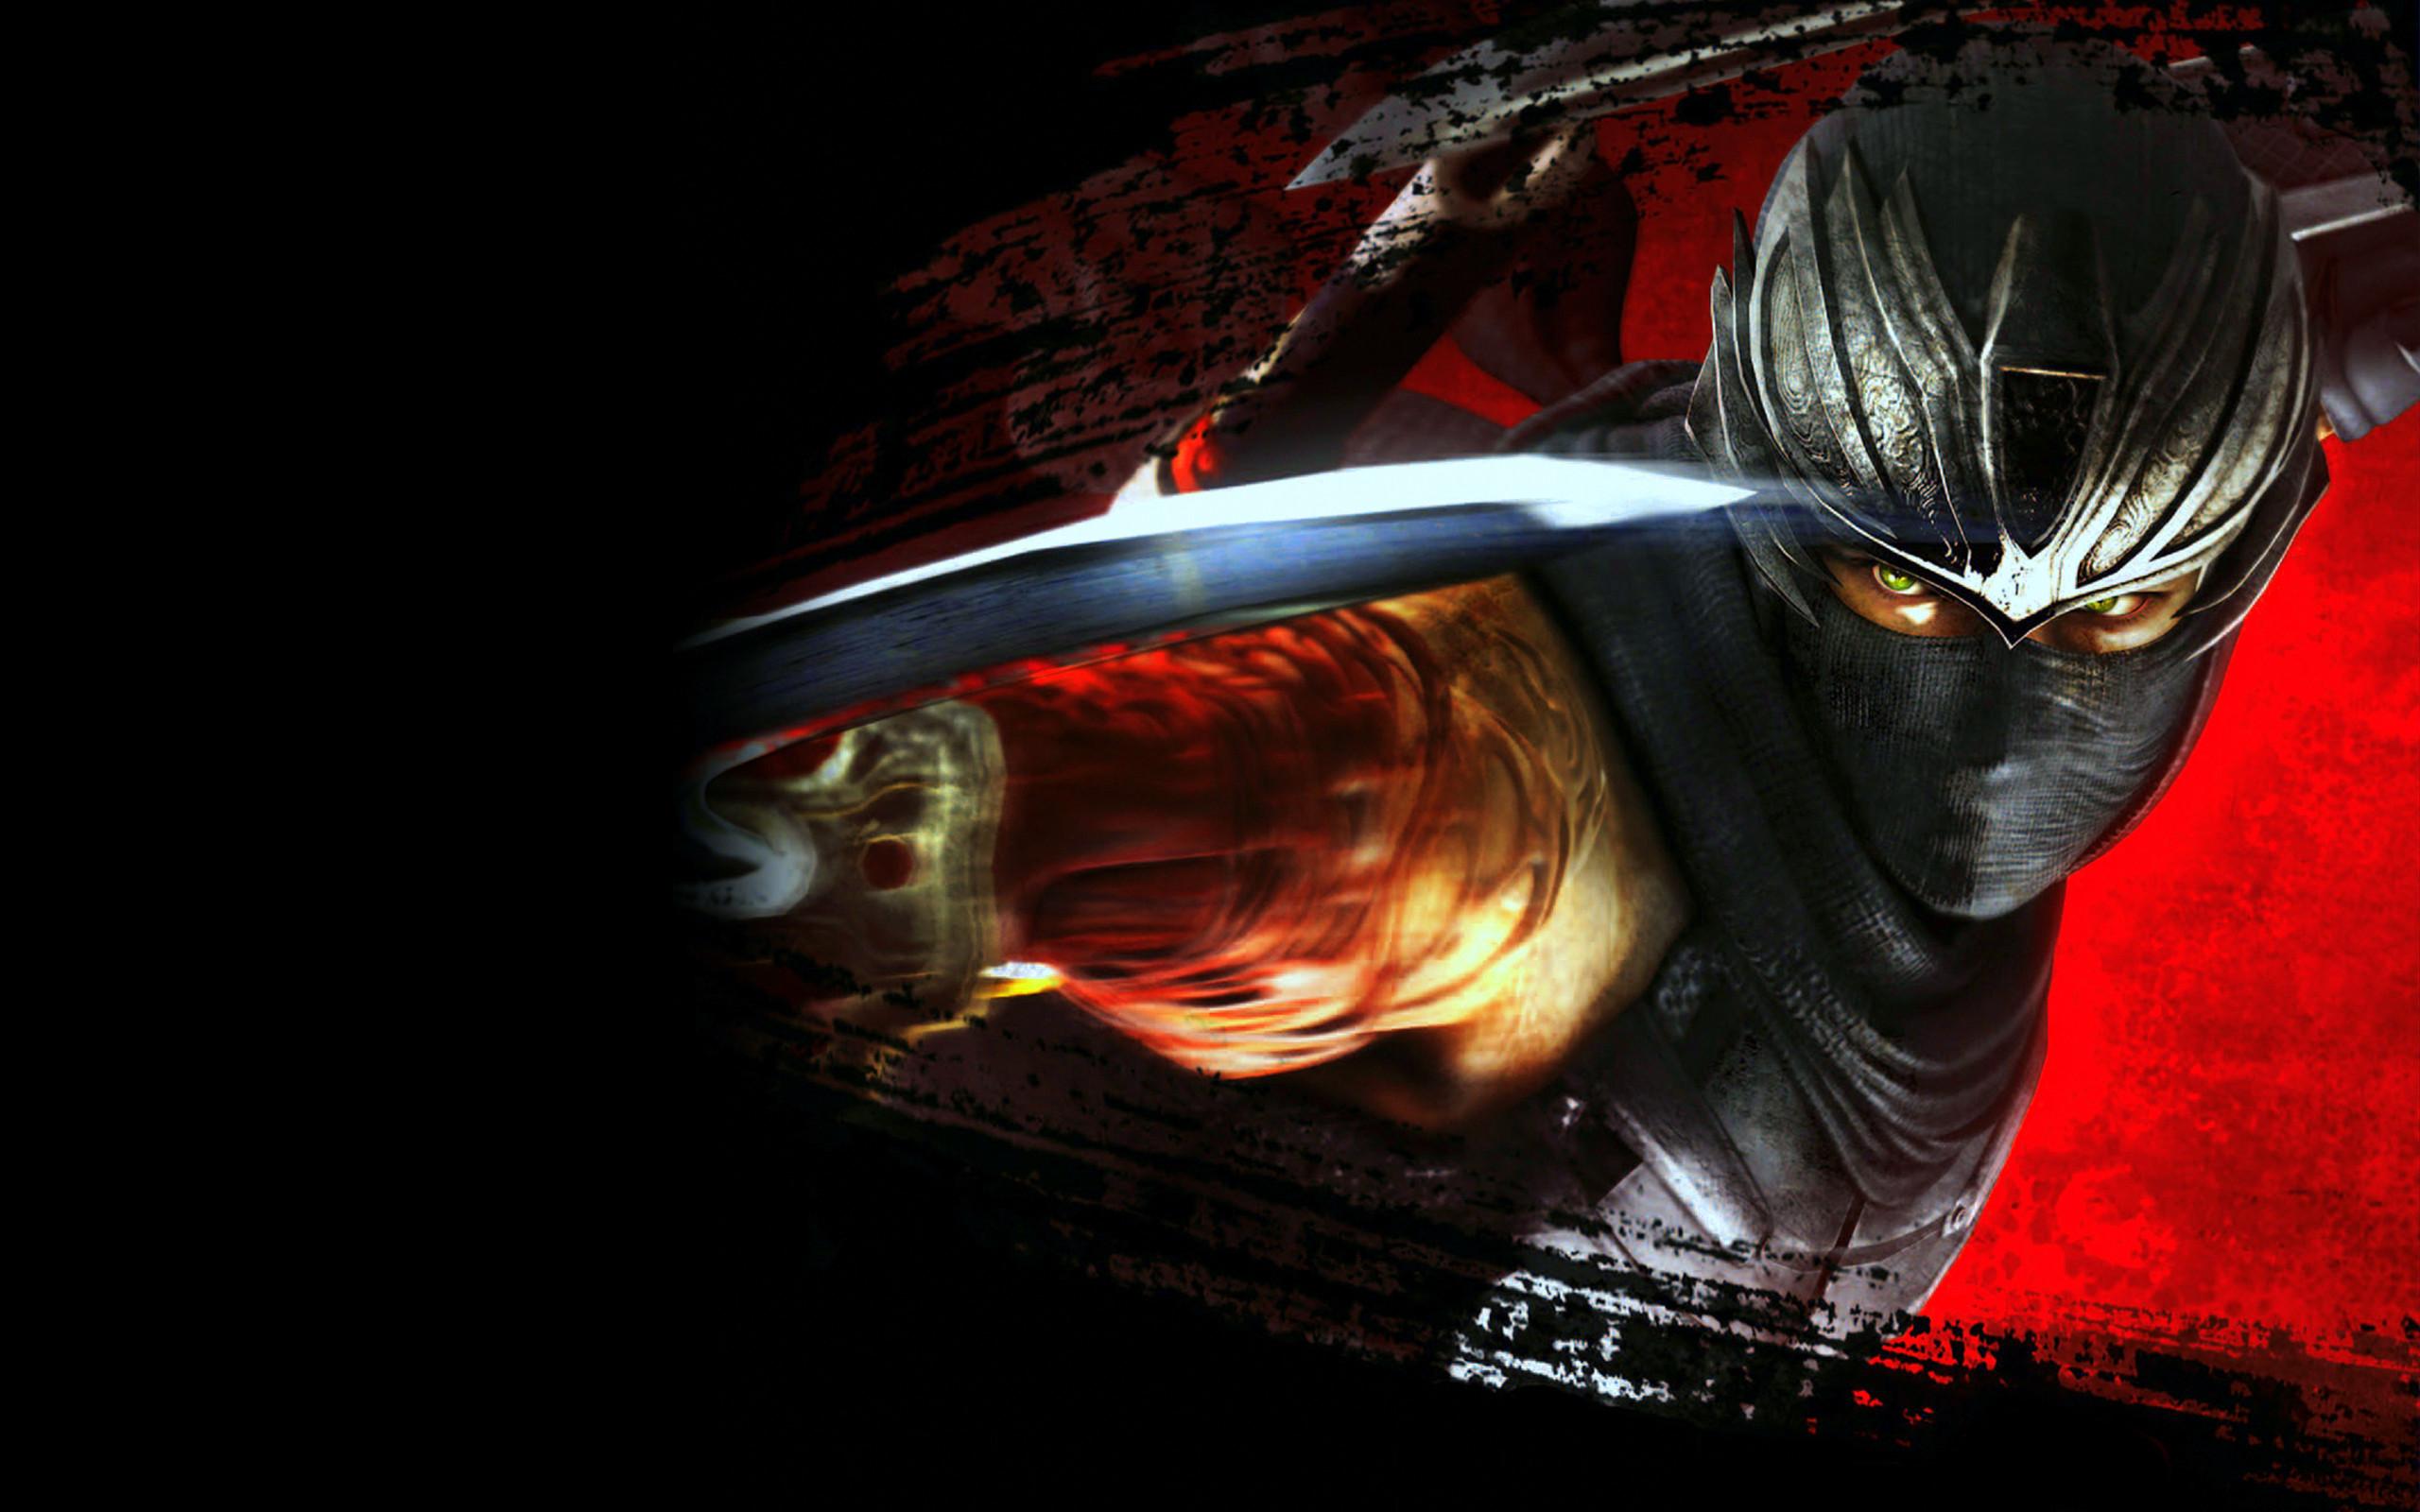 Res: 2560x1600, NINJA GAIDEN fantasy anime warrior weapon sword blood g wallpaper |   | 212510 | WallpaperUP